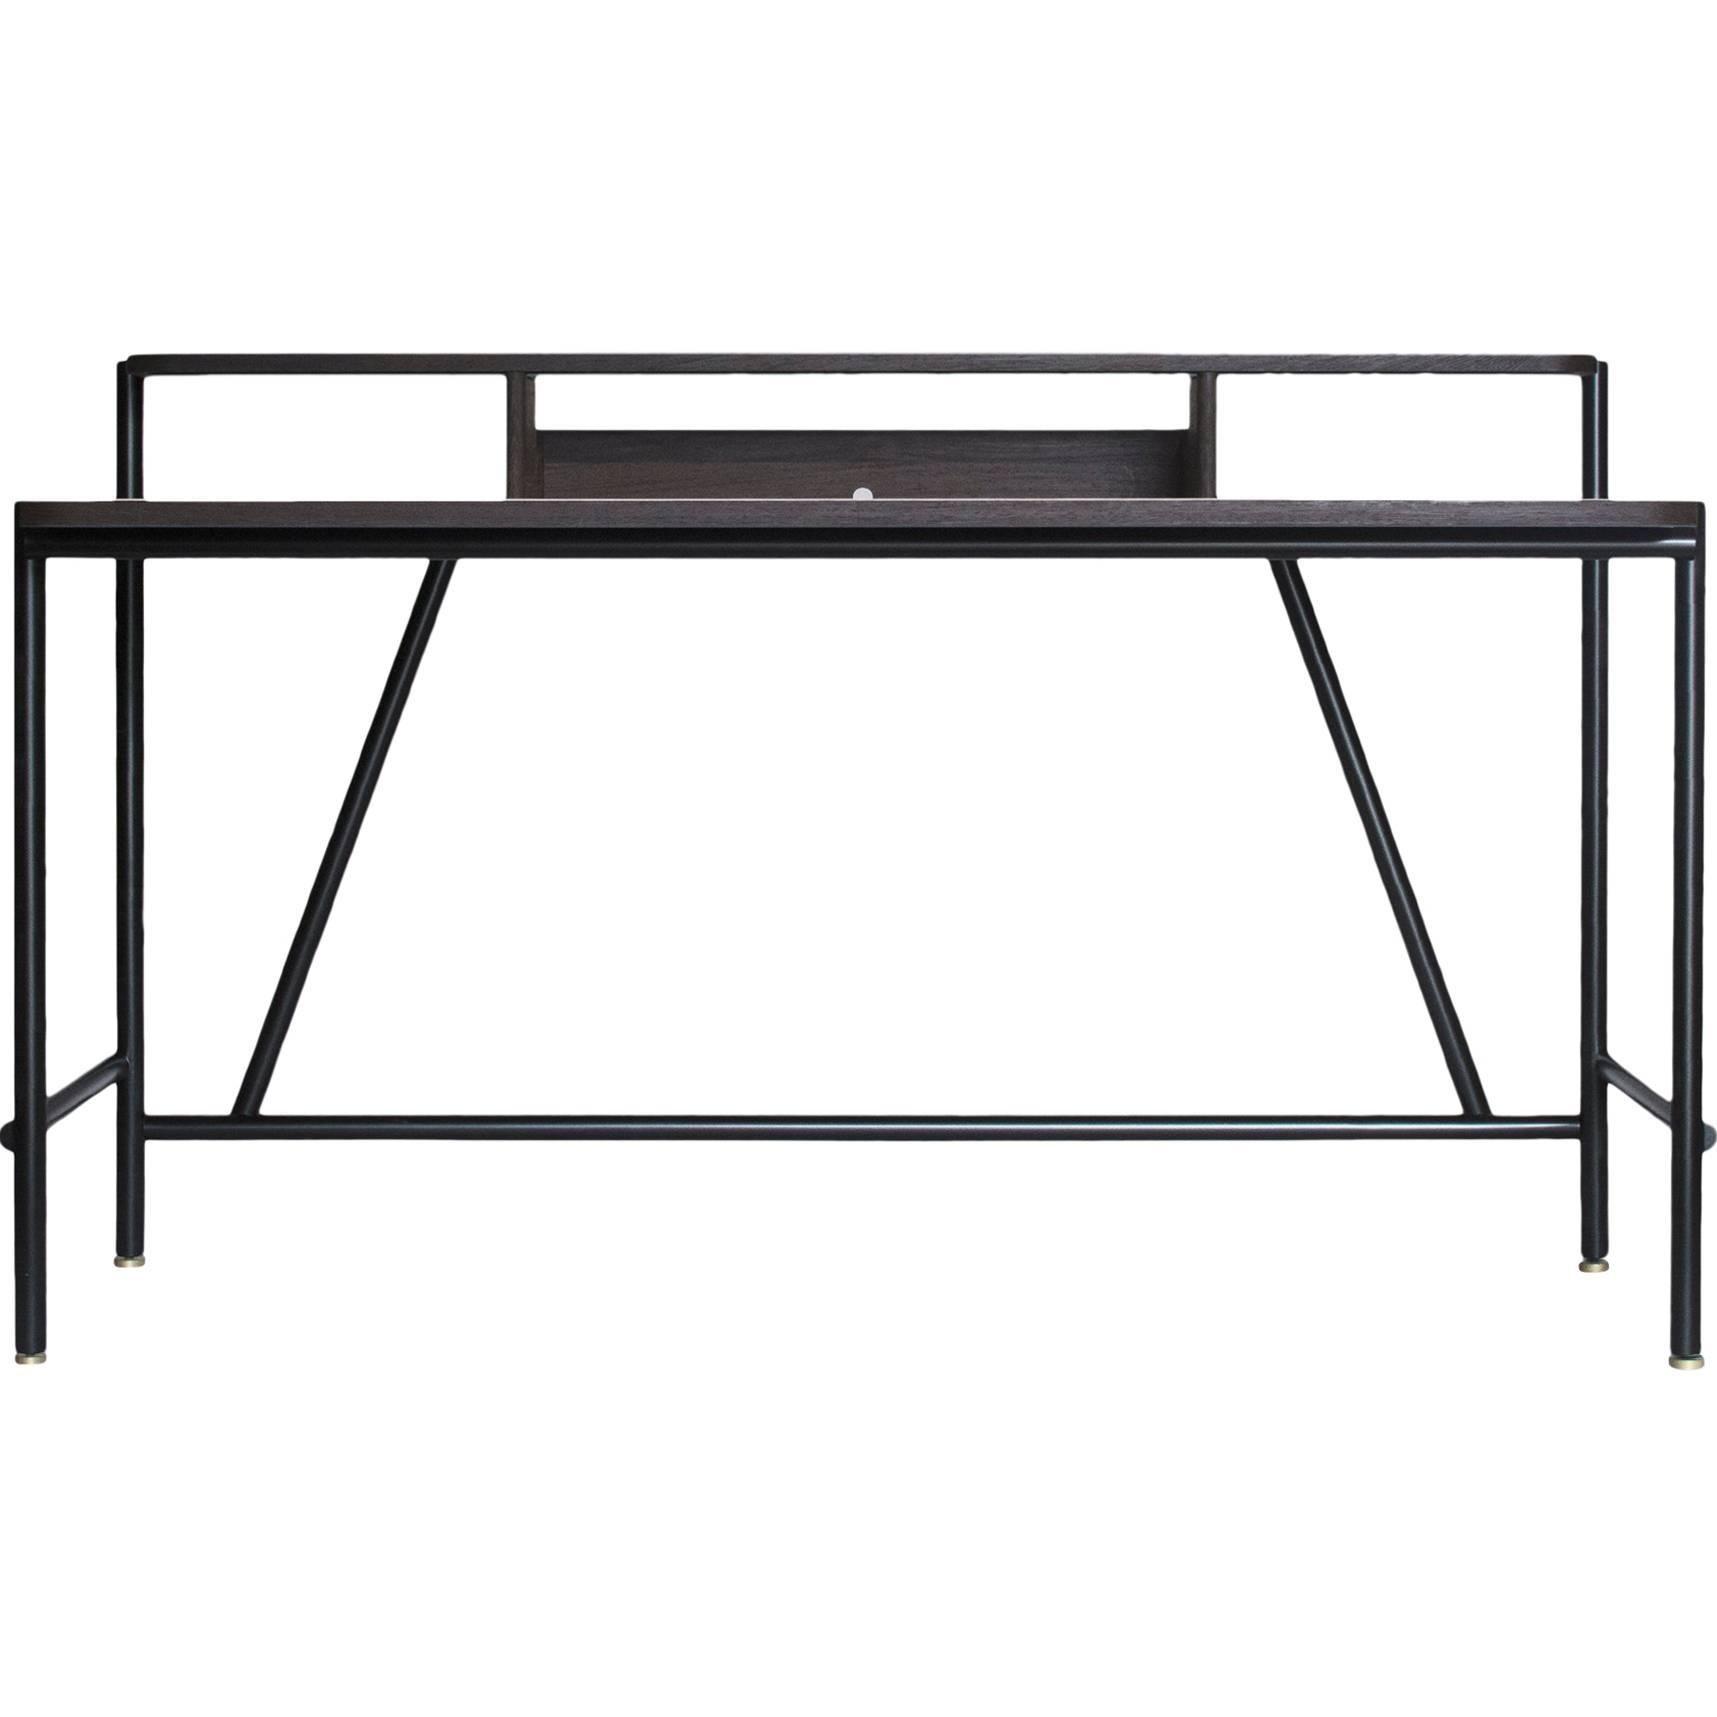 EM Desk by DUVALD Contemporary Vanity Desk Handcrafted in Denmark. Mirror.